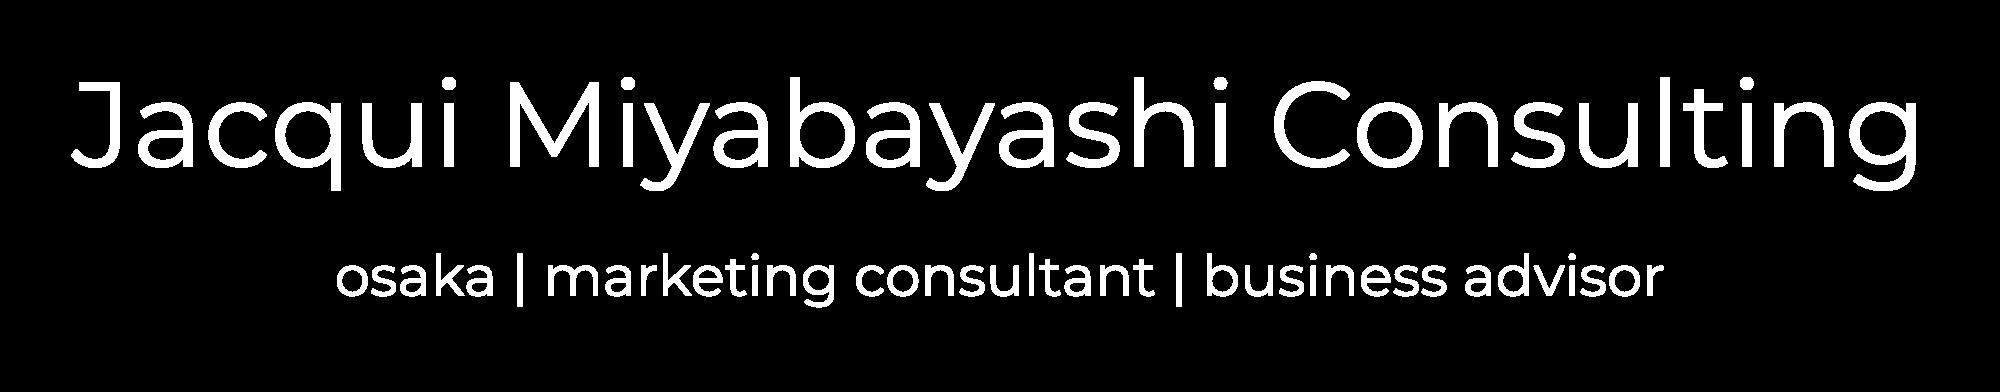 Jacqui Miyabayashi Consulting-logo-white.png